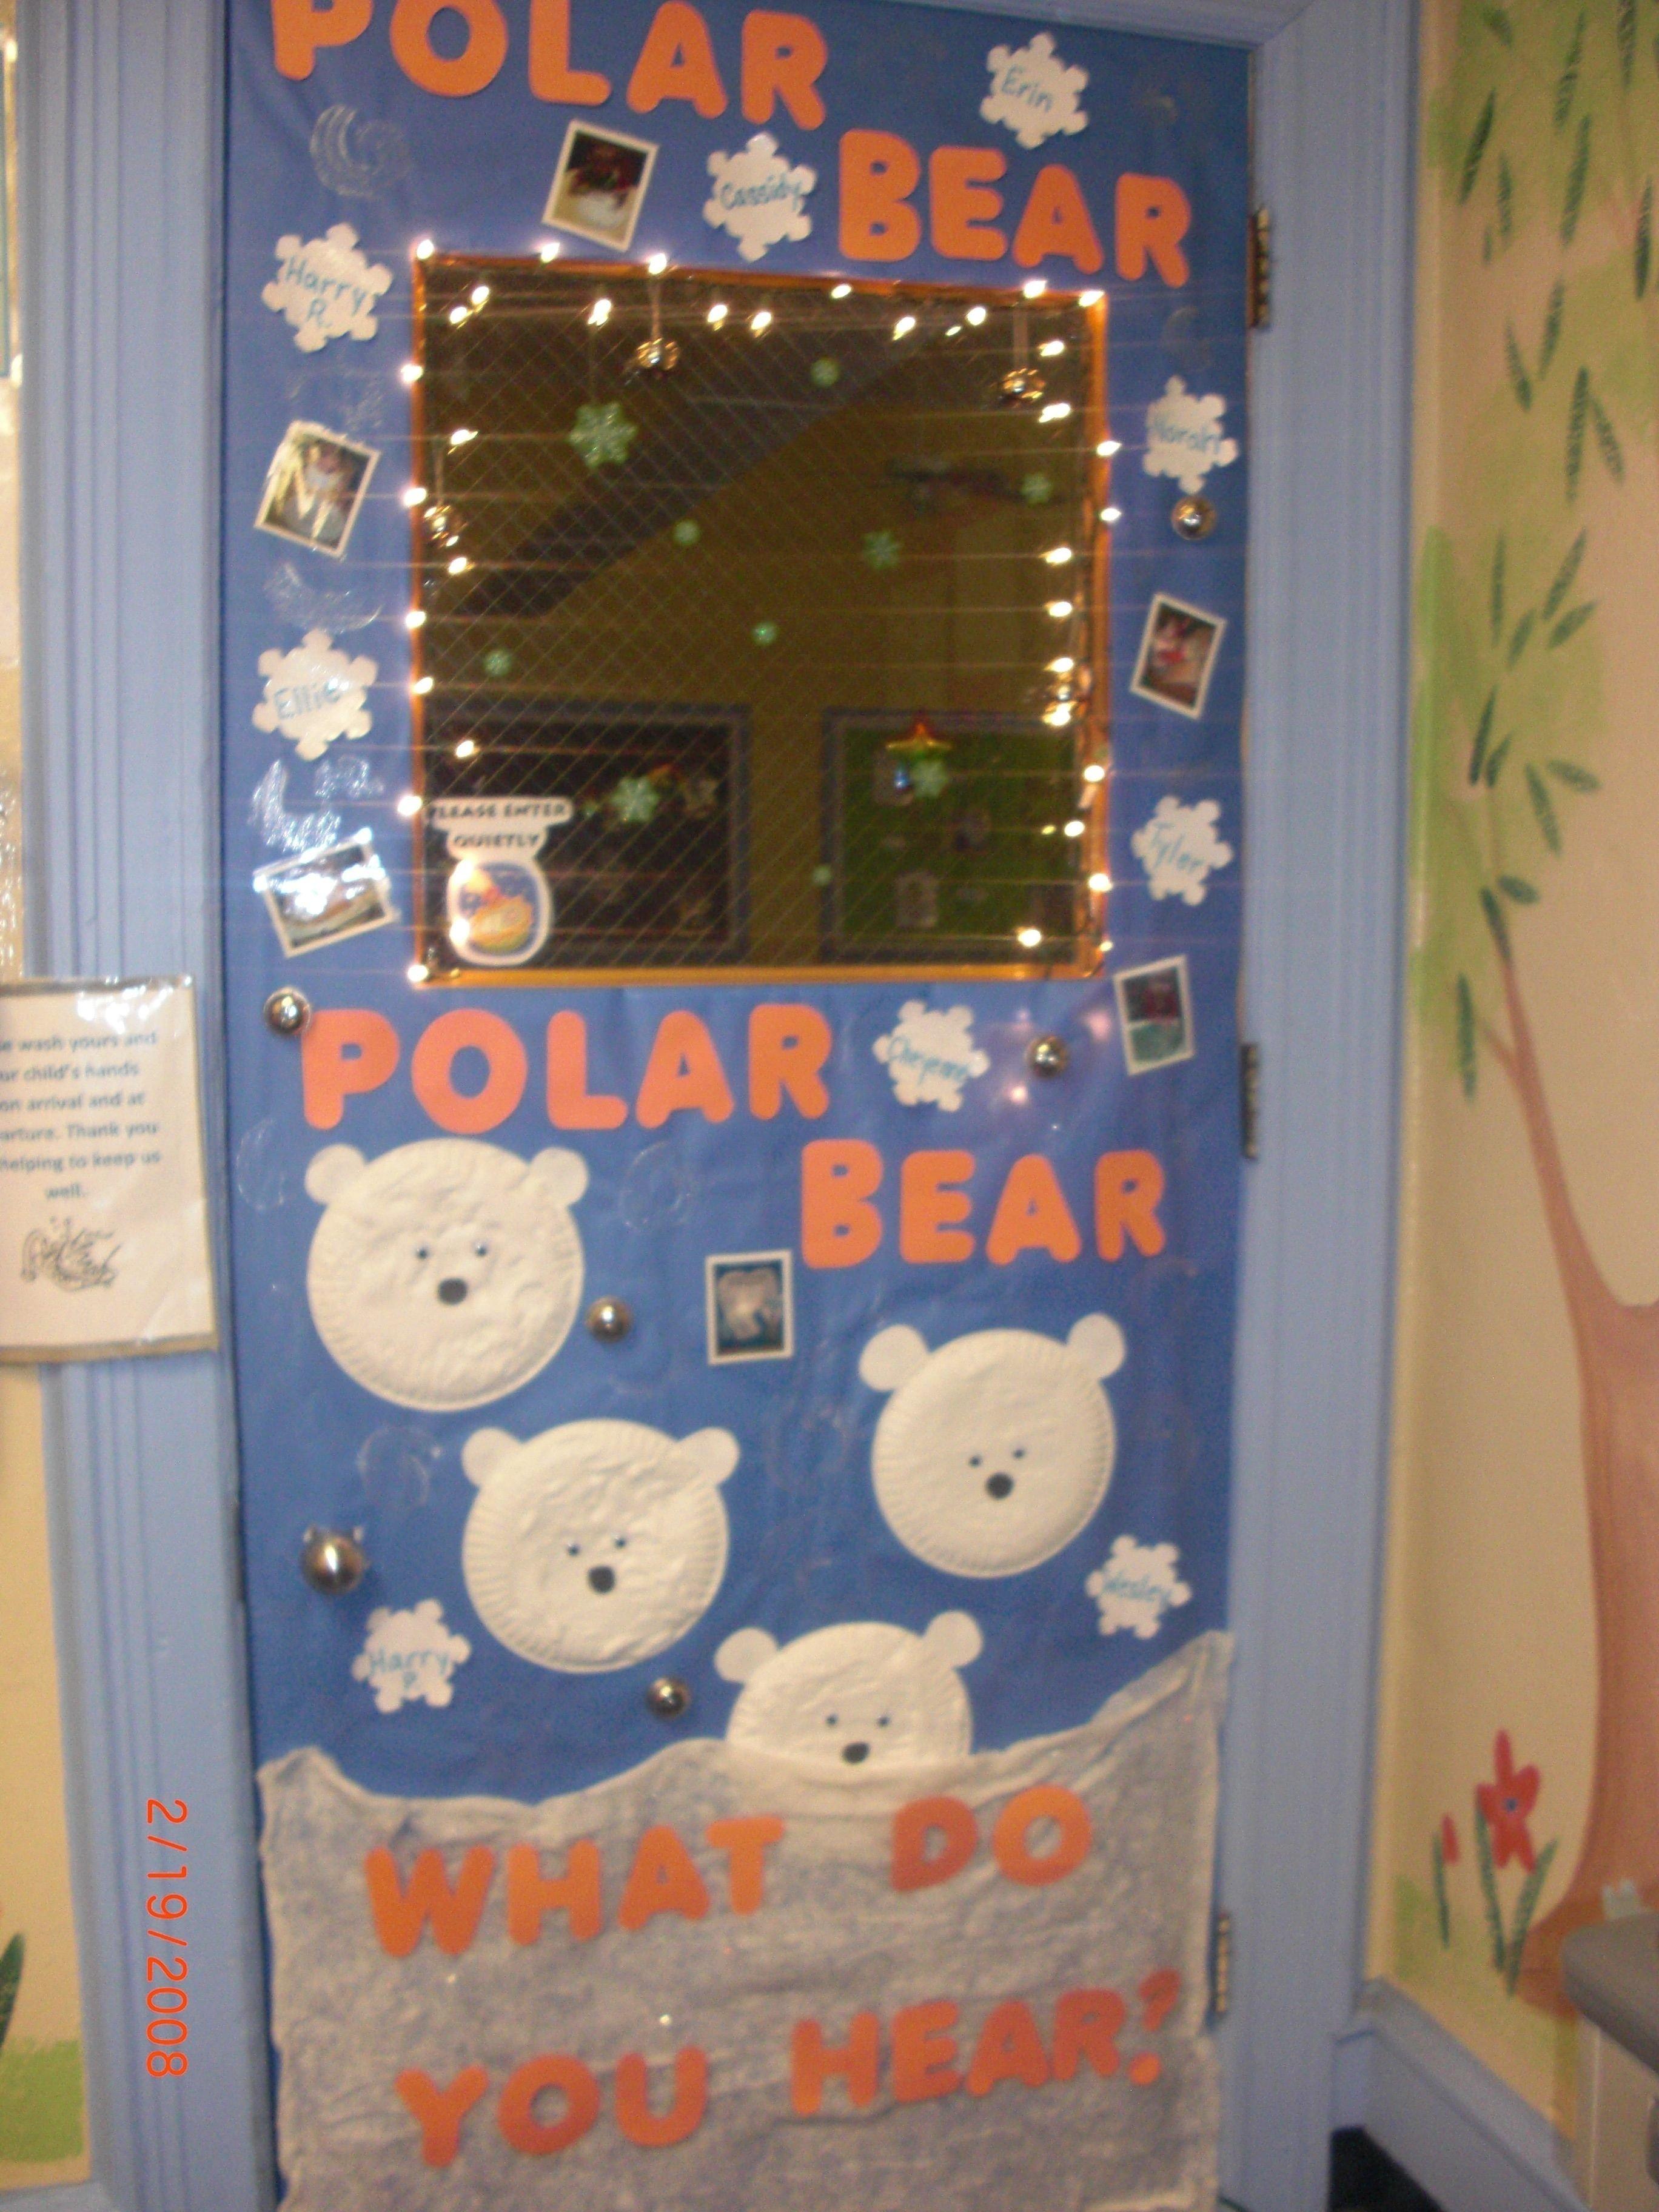 10 Gorgeous Winter Wonderland Bulletin Board Ideas play learn lansdale pa polar bear polar bear winter 2021